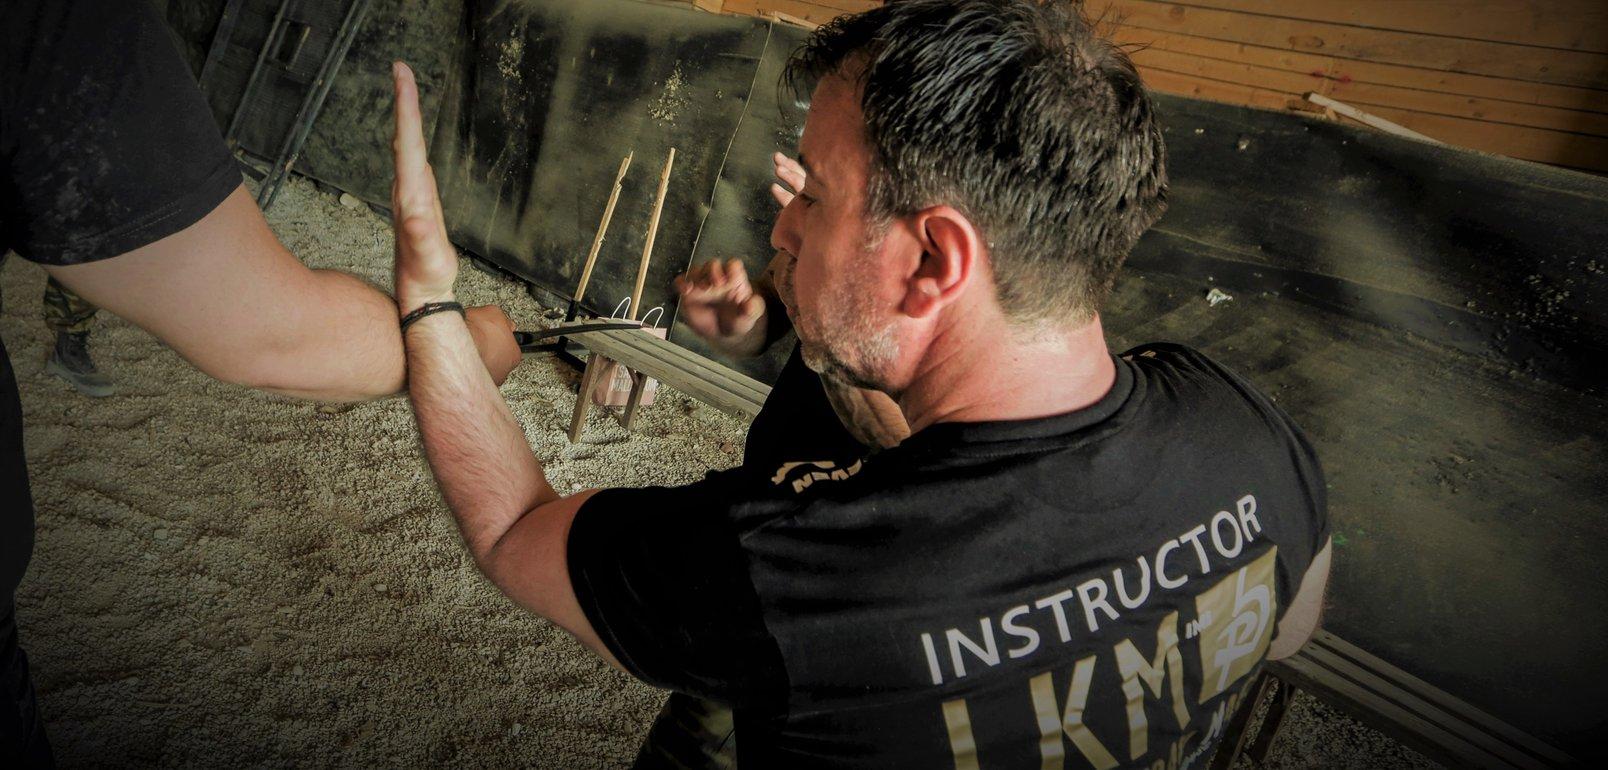 Krav Maga Course - Σχολείο εκπαίδευσης